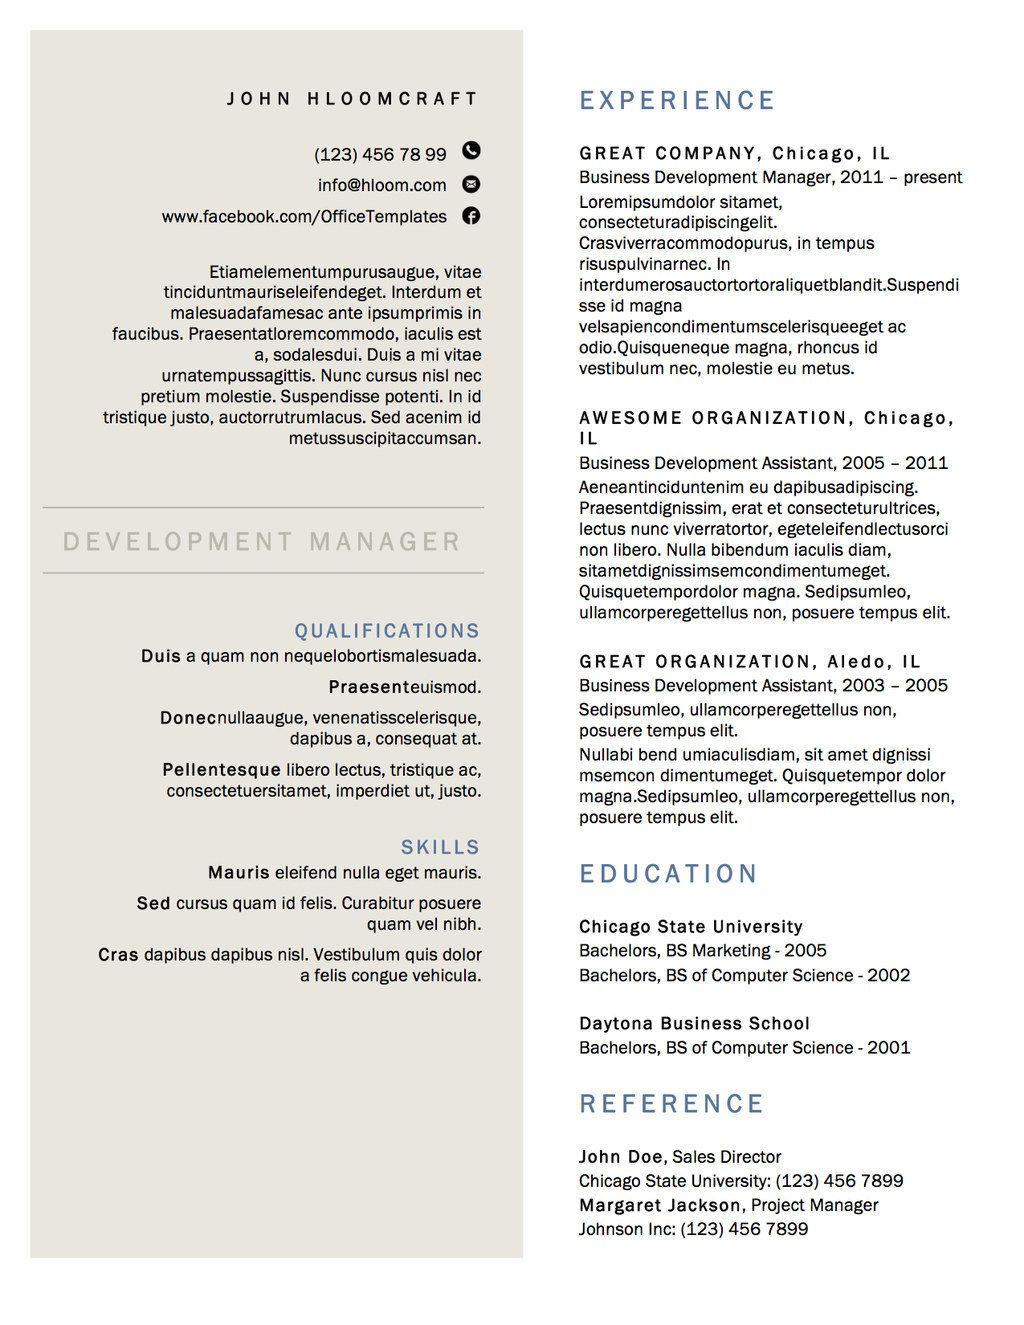 21 Free Résumé Designs Every Job Hunter Needs   Target, Caza y Columnas